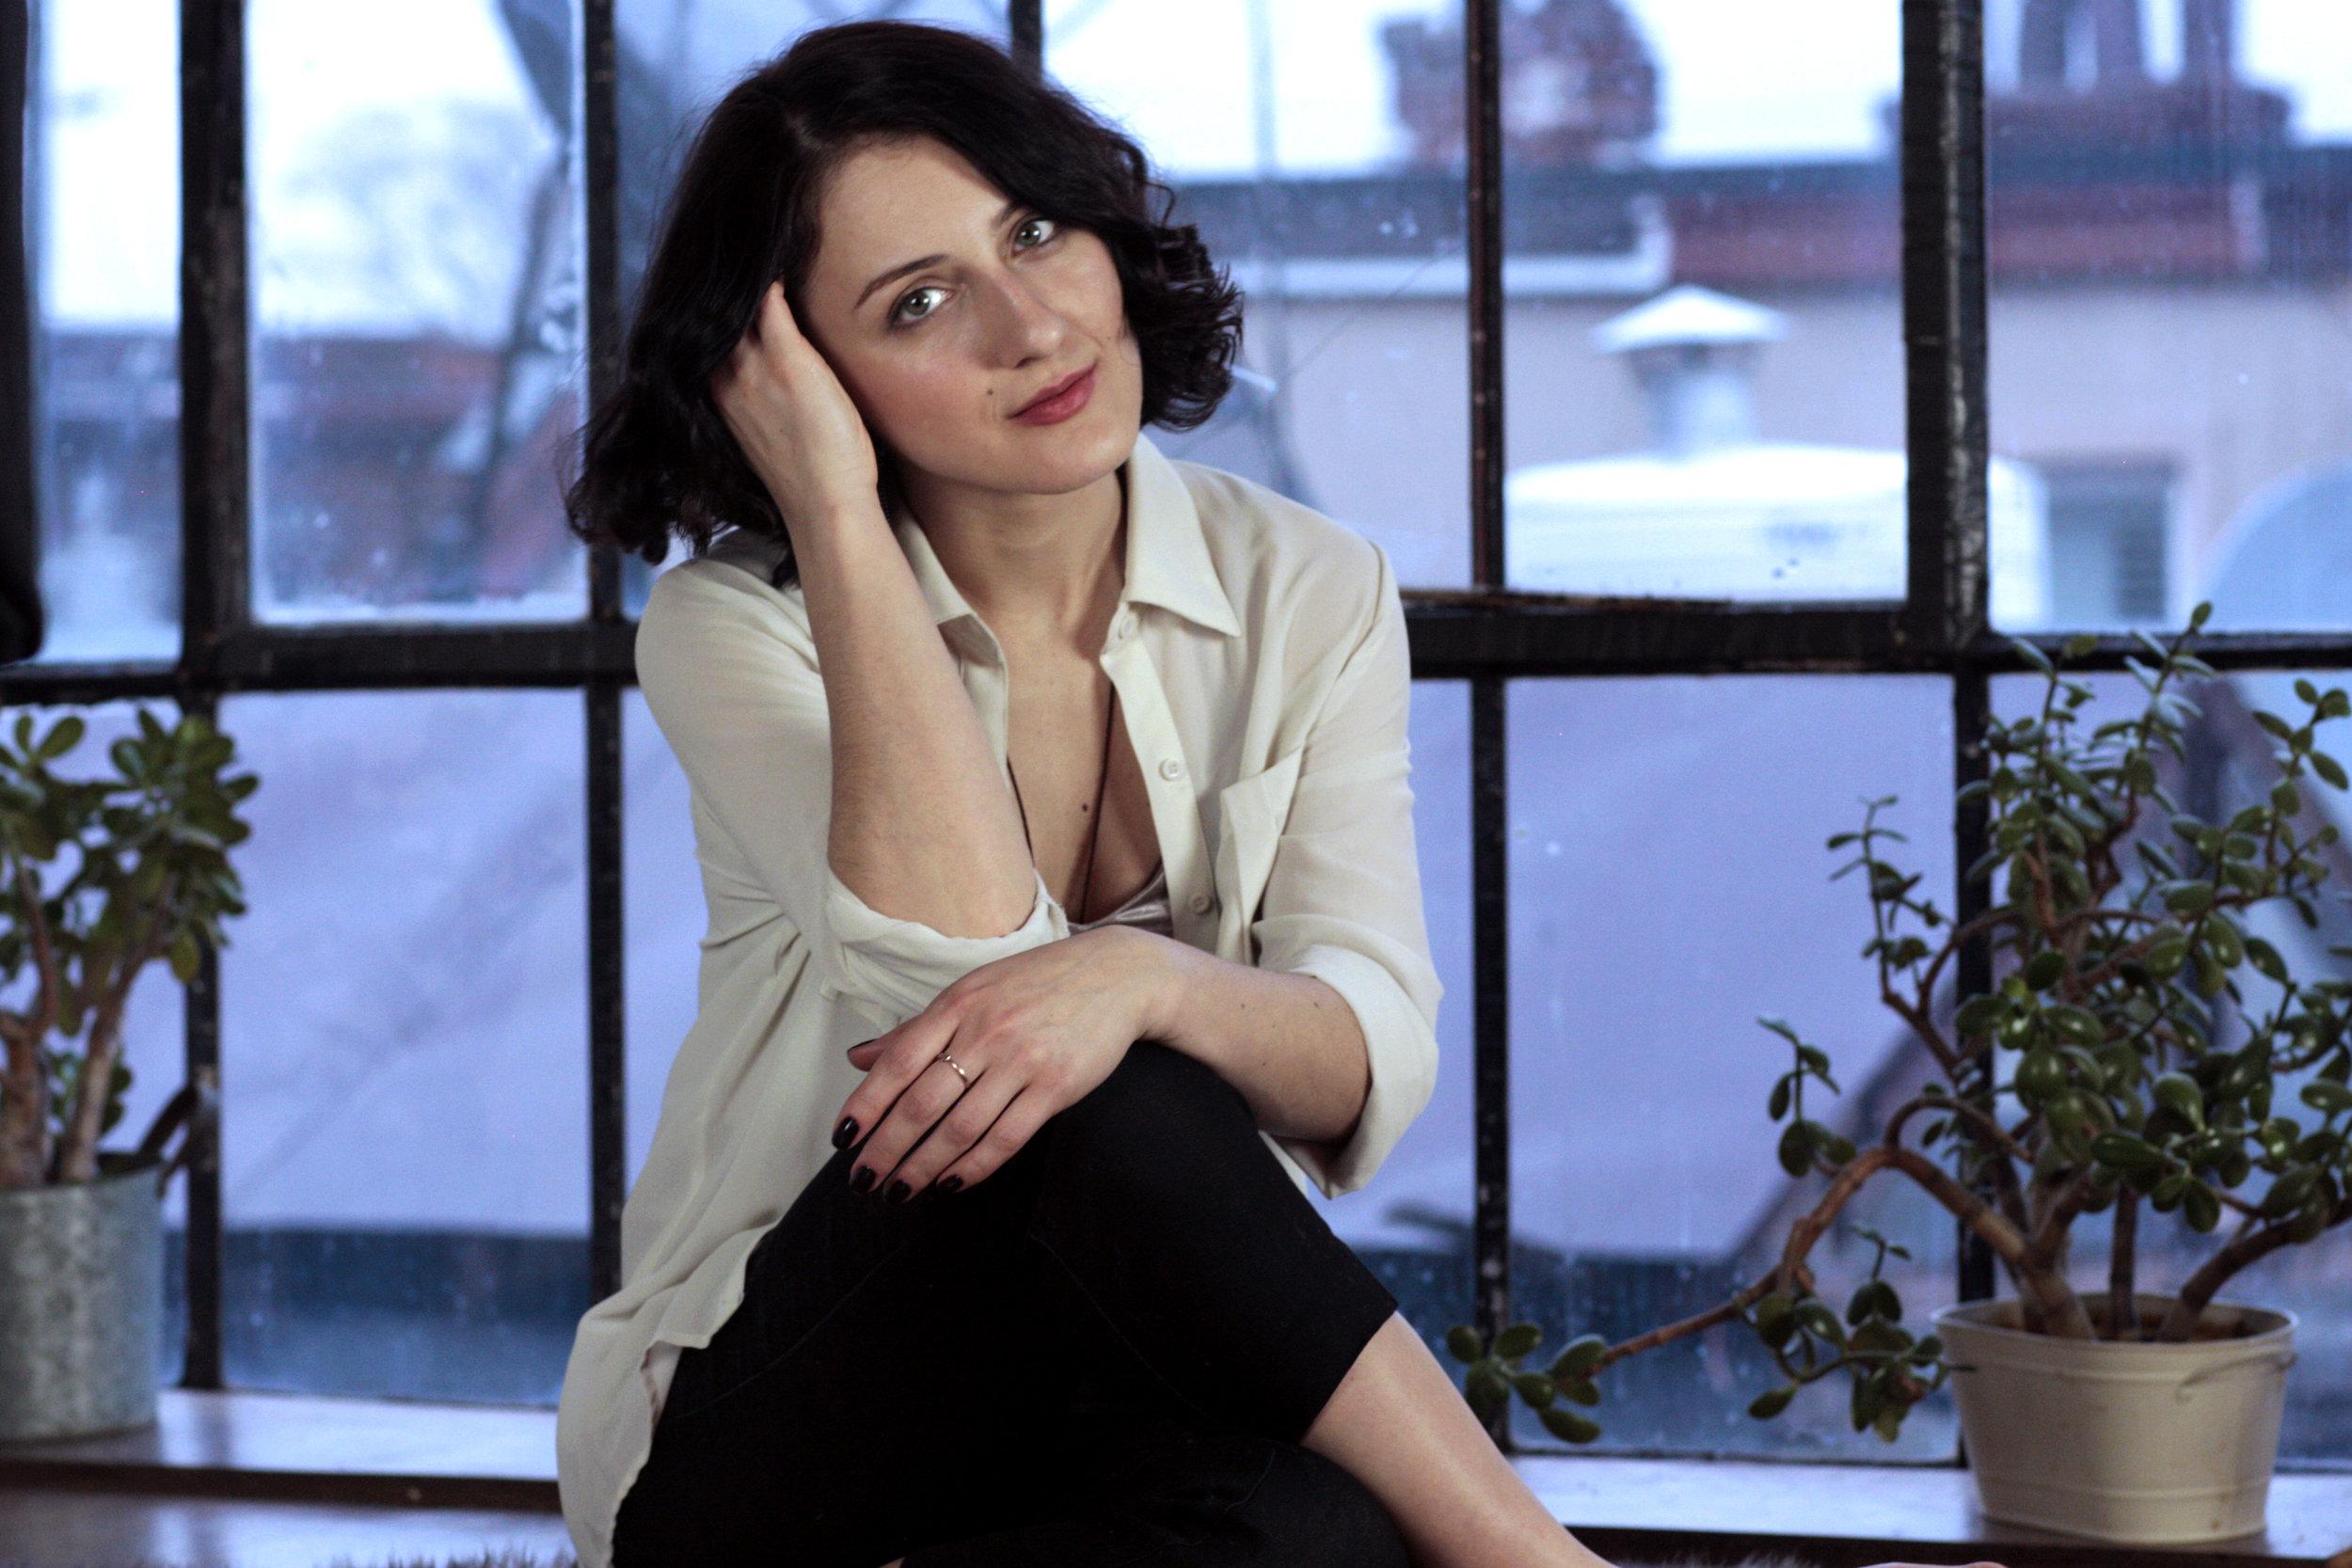 Marie Schoppen is an Integrative Wellness Specialist based in Toronto Canada.